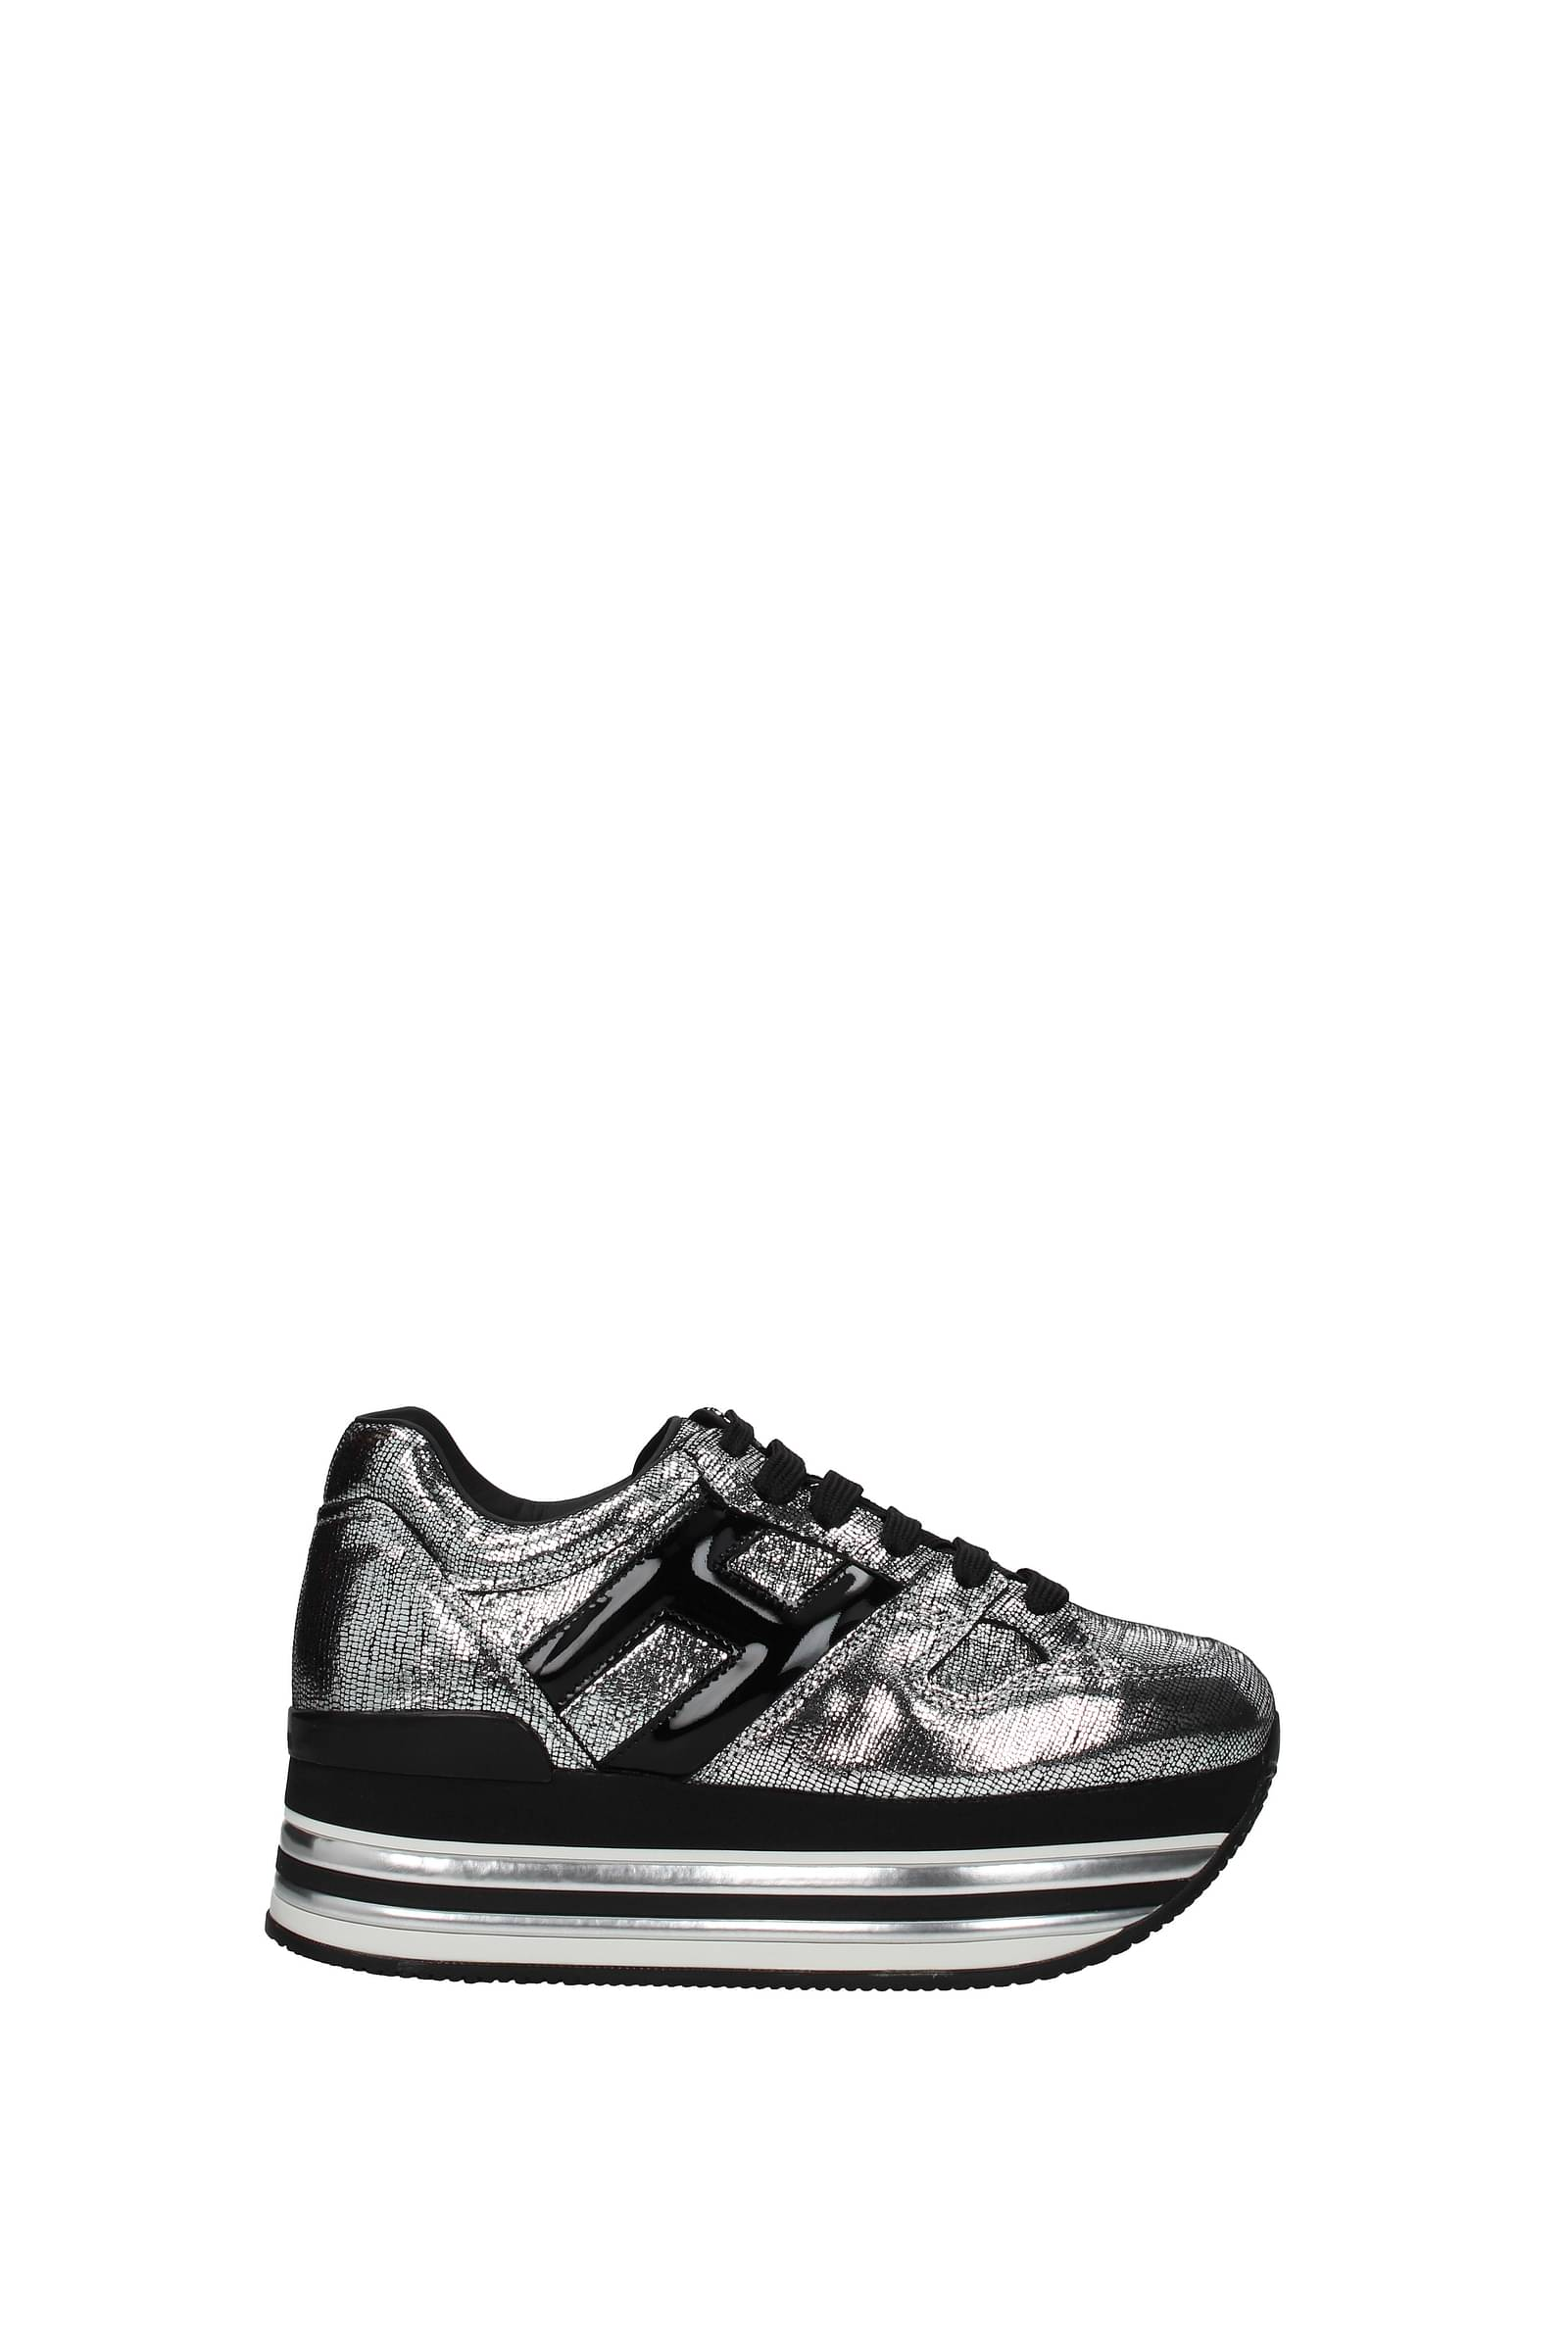 Sneakers Hogan online a prezzi scontati